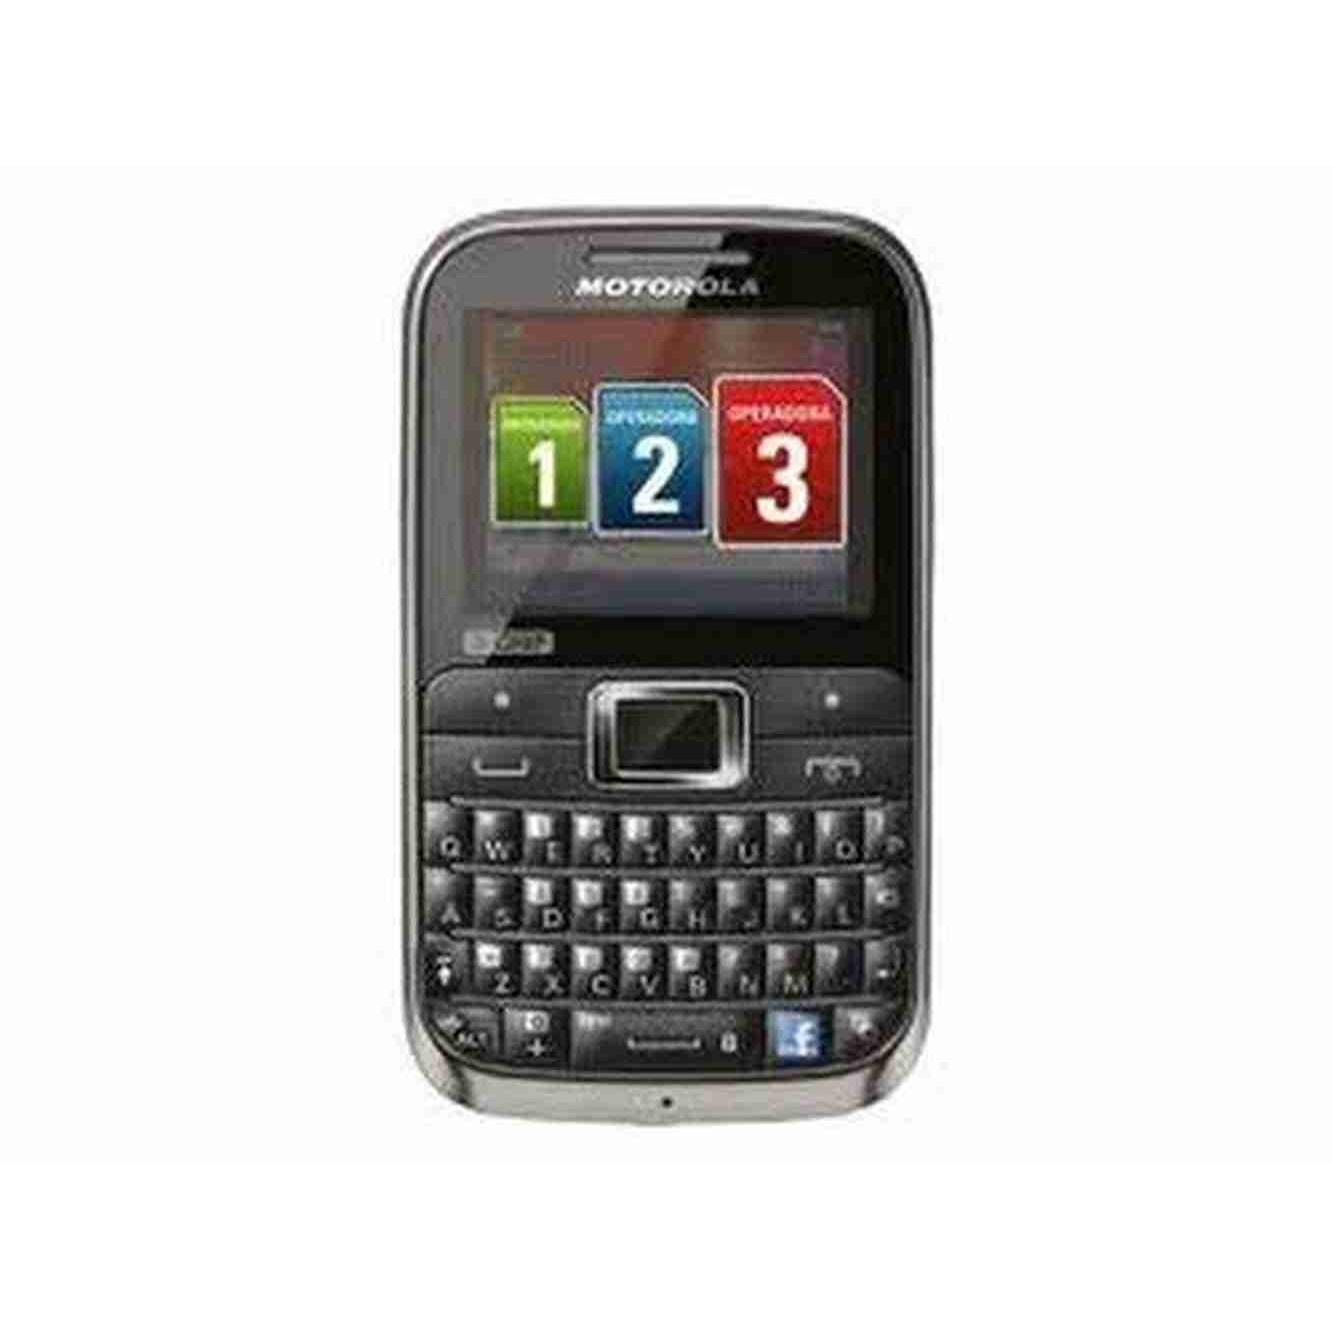 LCD Screen for Motorola MOTOKEY 3-CHIP EX117 - Replacement Display